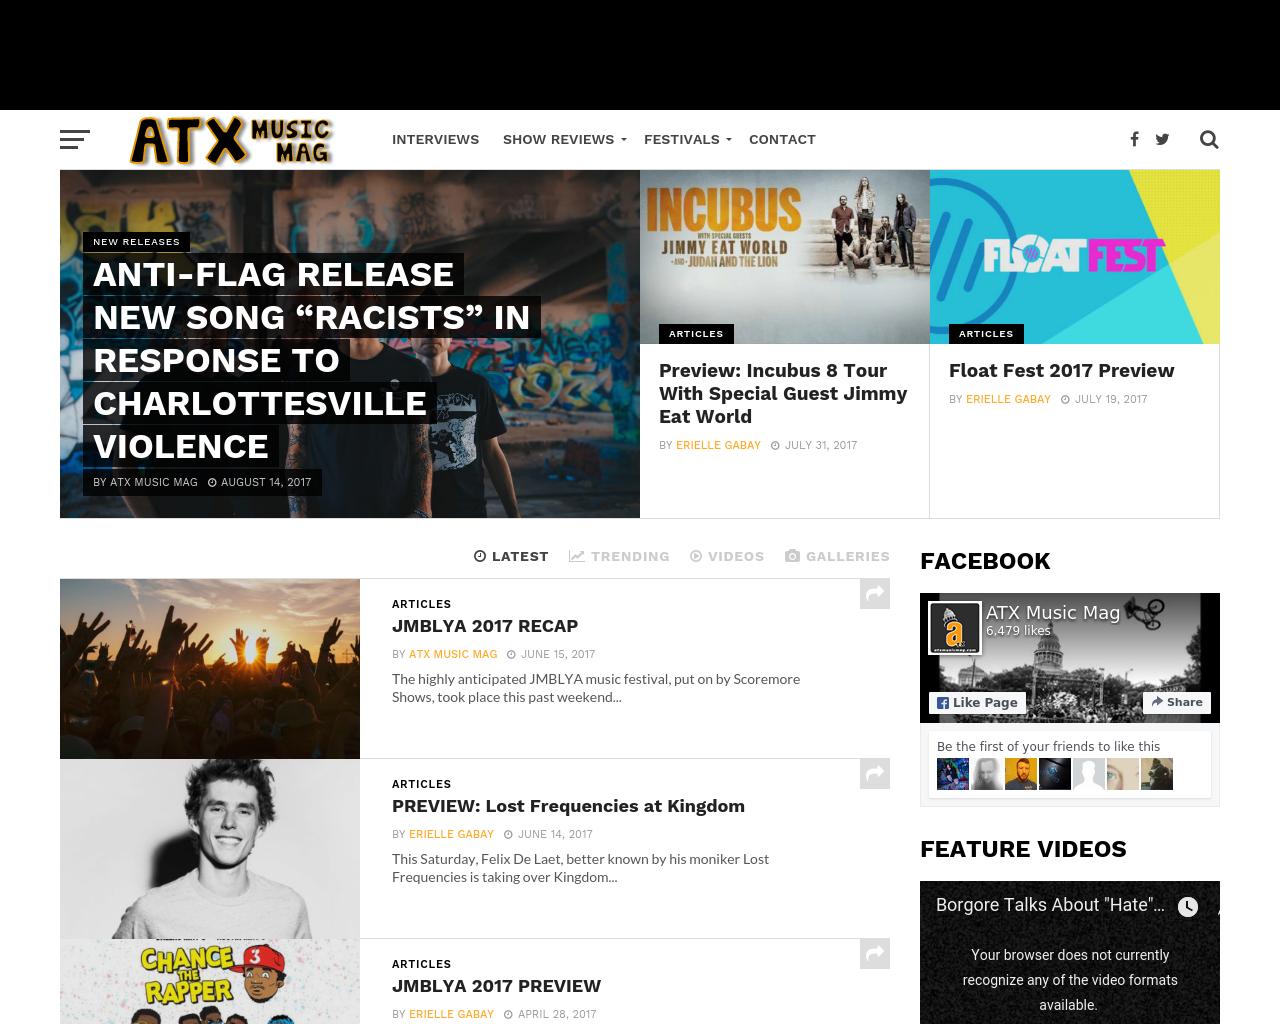 ATX-Music-Mag-Advertising-Reviews-Pricing